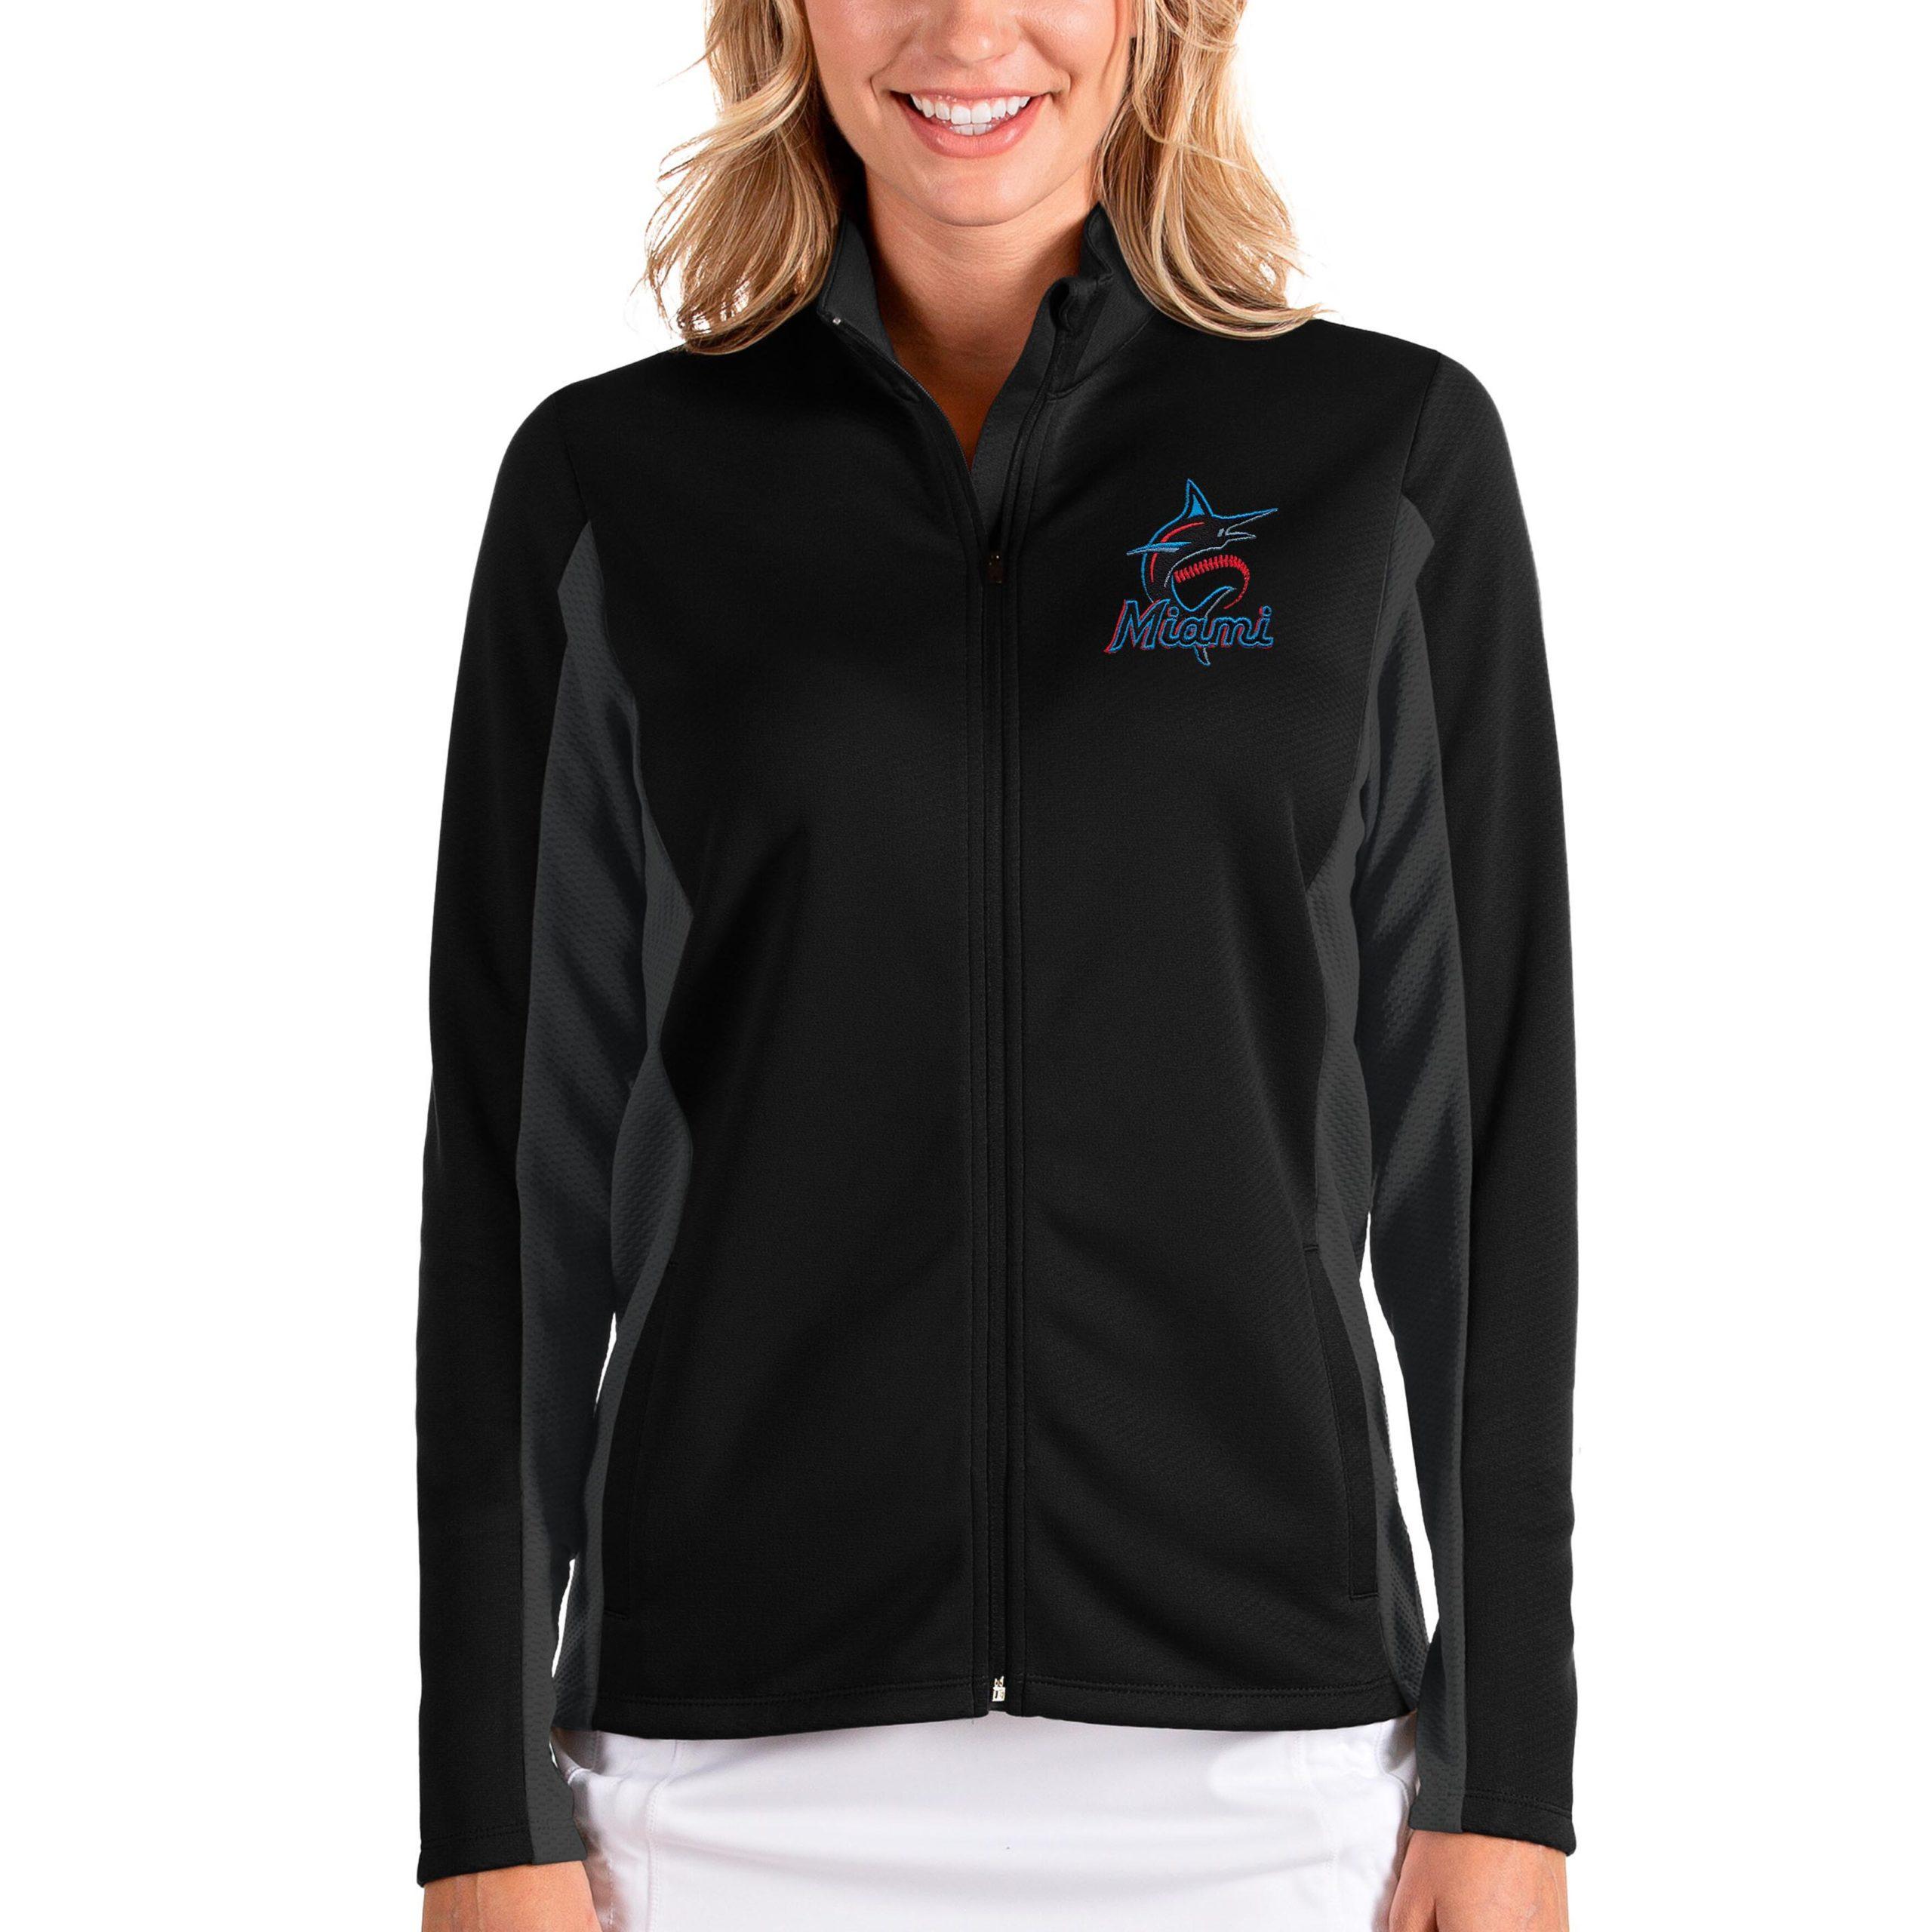 Miami Marlins Antigua Women's Passage Full-Zip Jacket - Black/Charcoal